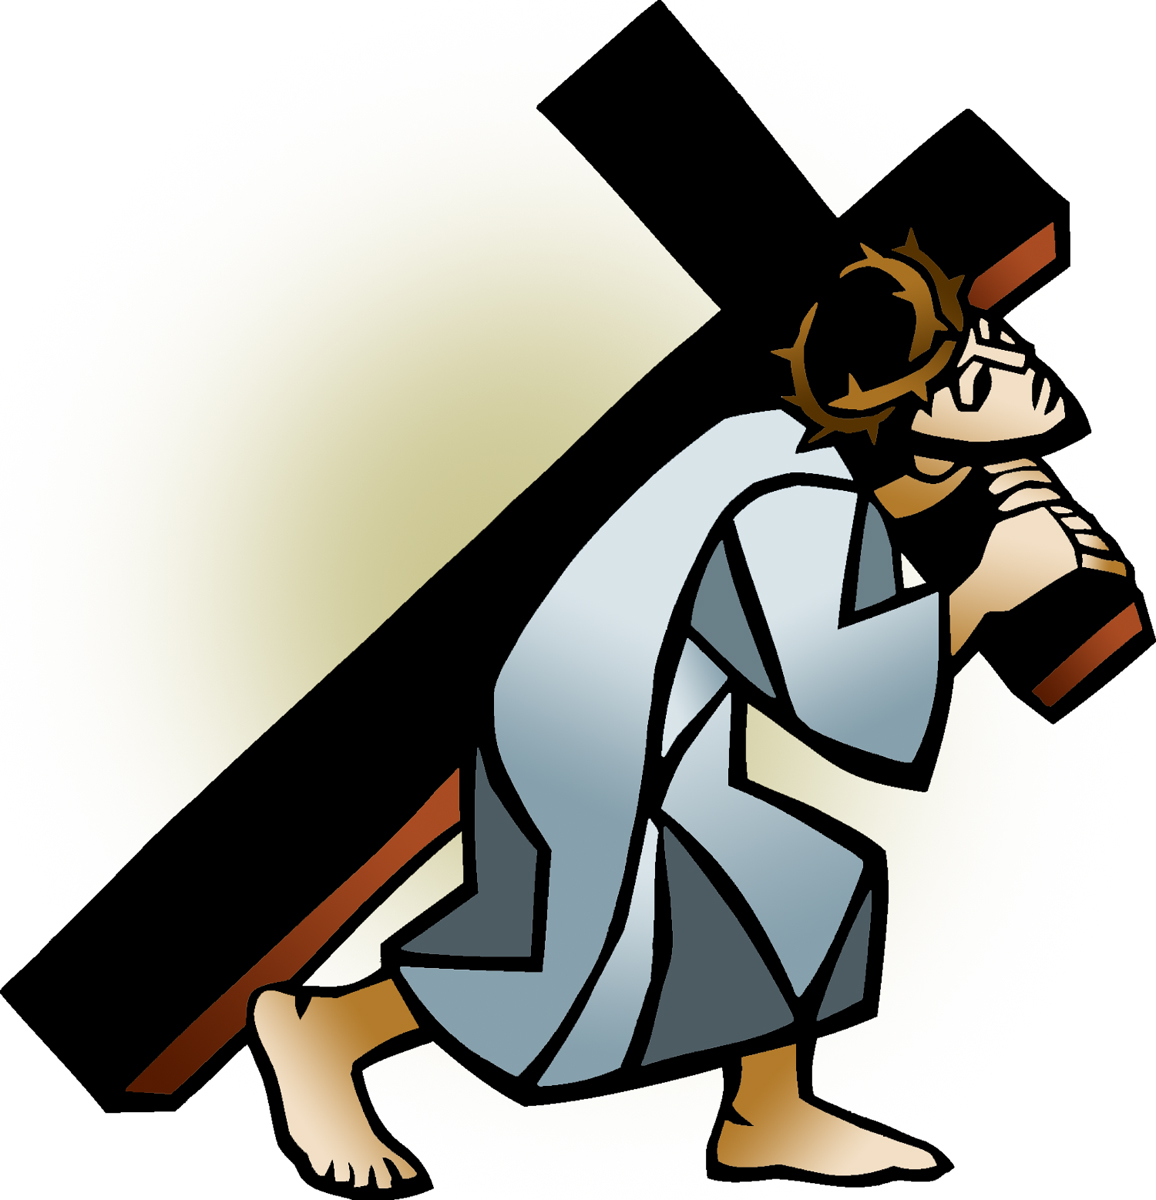 Jesus carries cross play clipart.